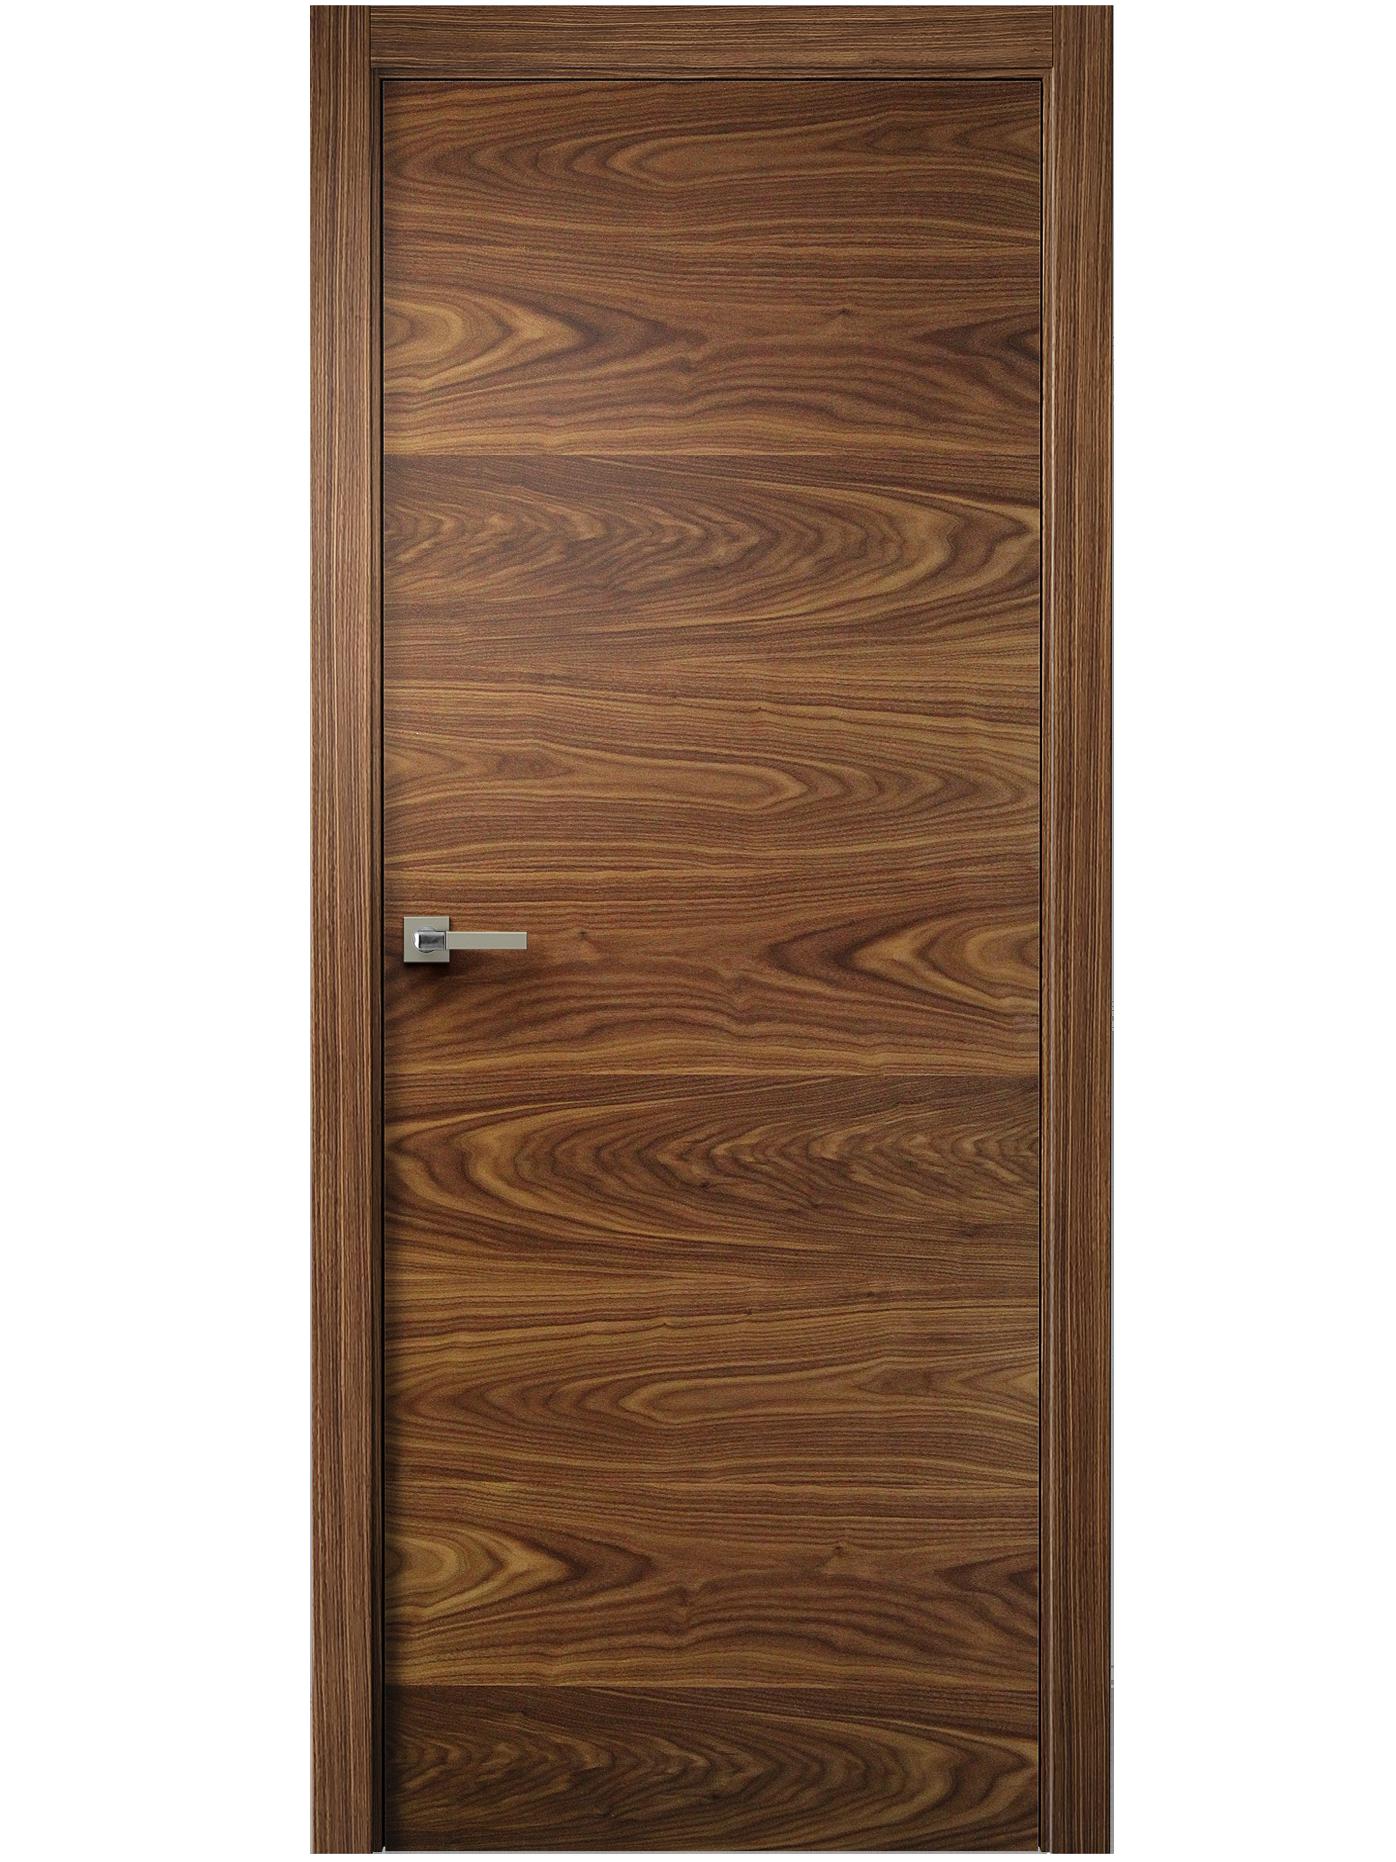 Image Sana Interior Door American Walnut 0